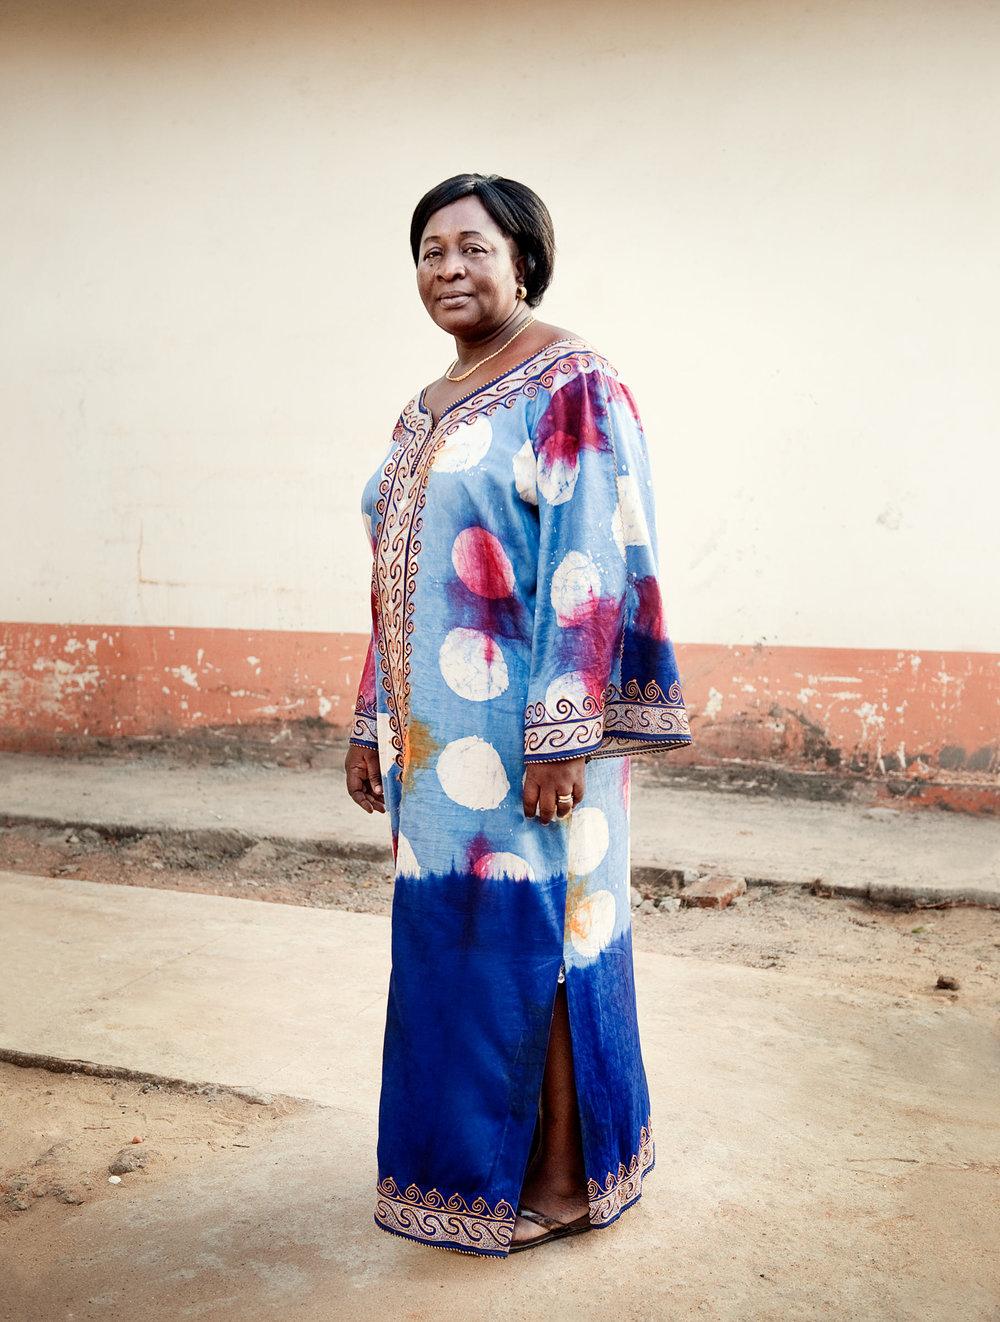 Portfolio_483_Voices_Africa_Togo_print6_KRISTOFER SAMUELSSON PHOTOGRAPHY.jpg